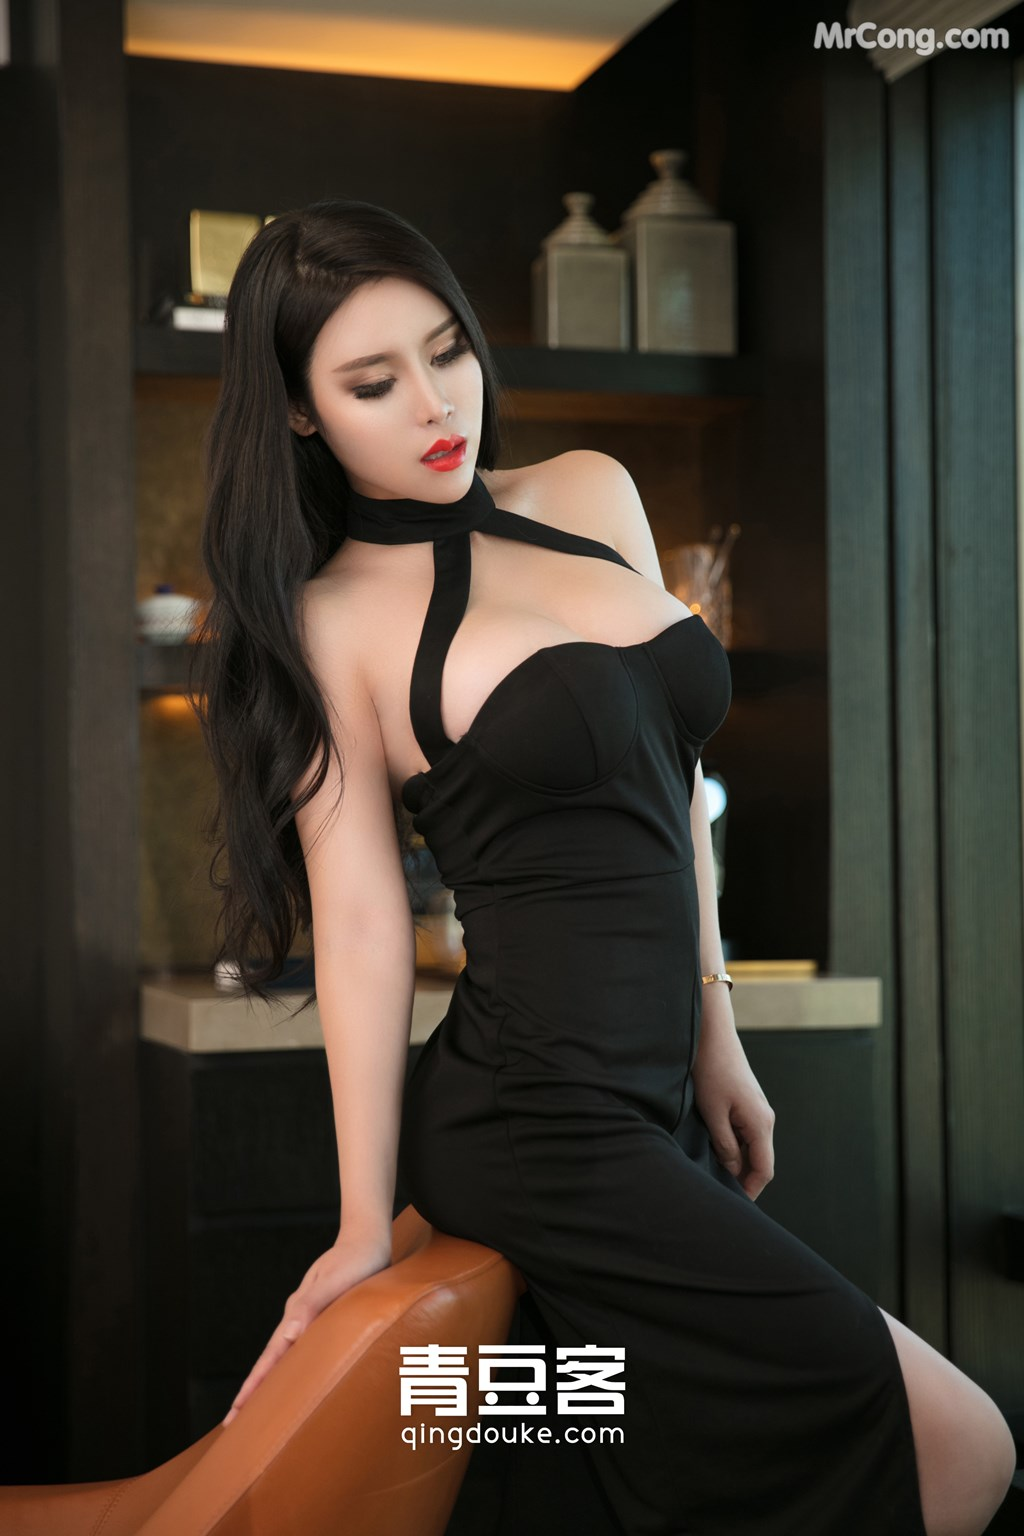 Image QingDouKe-2017-11-05-Ke-Rui-Na-MrCong.com-005 in post QingDouKe 2017-11-05: Người mẫu Ke Rui Na (可蕊娜) (48 ảnh)